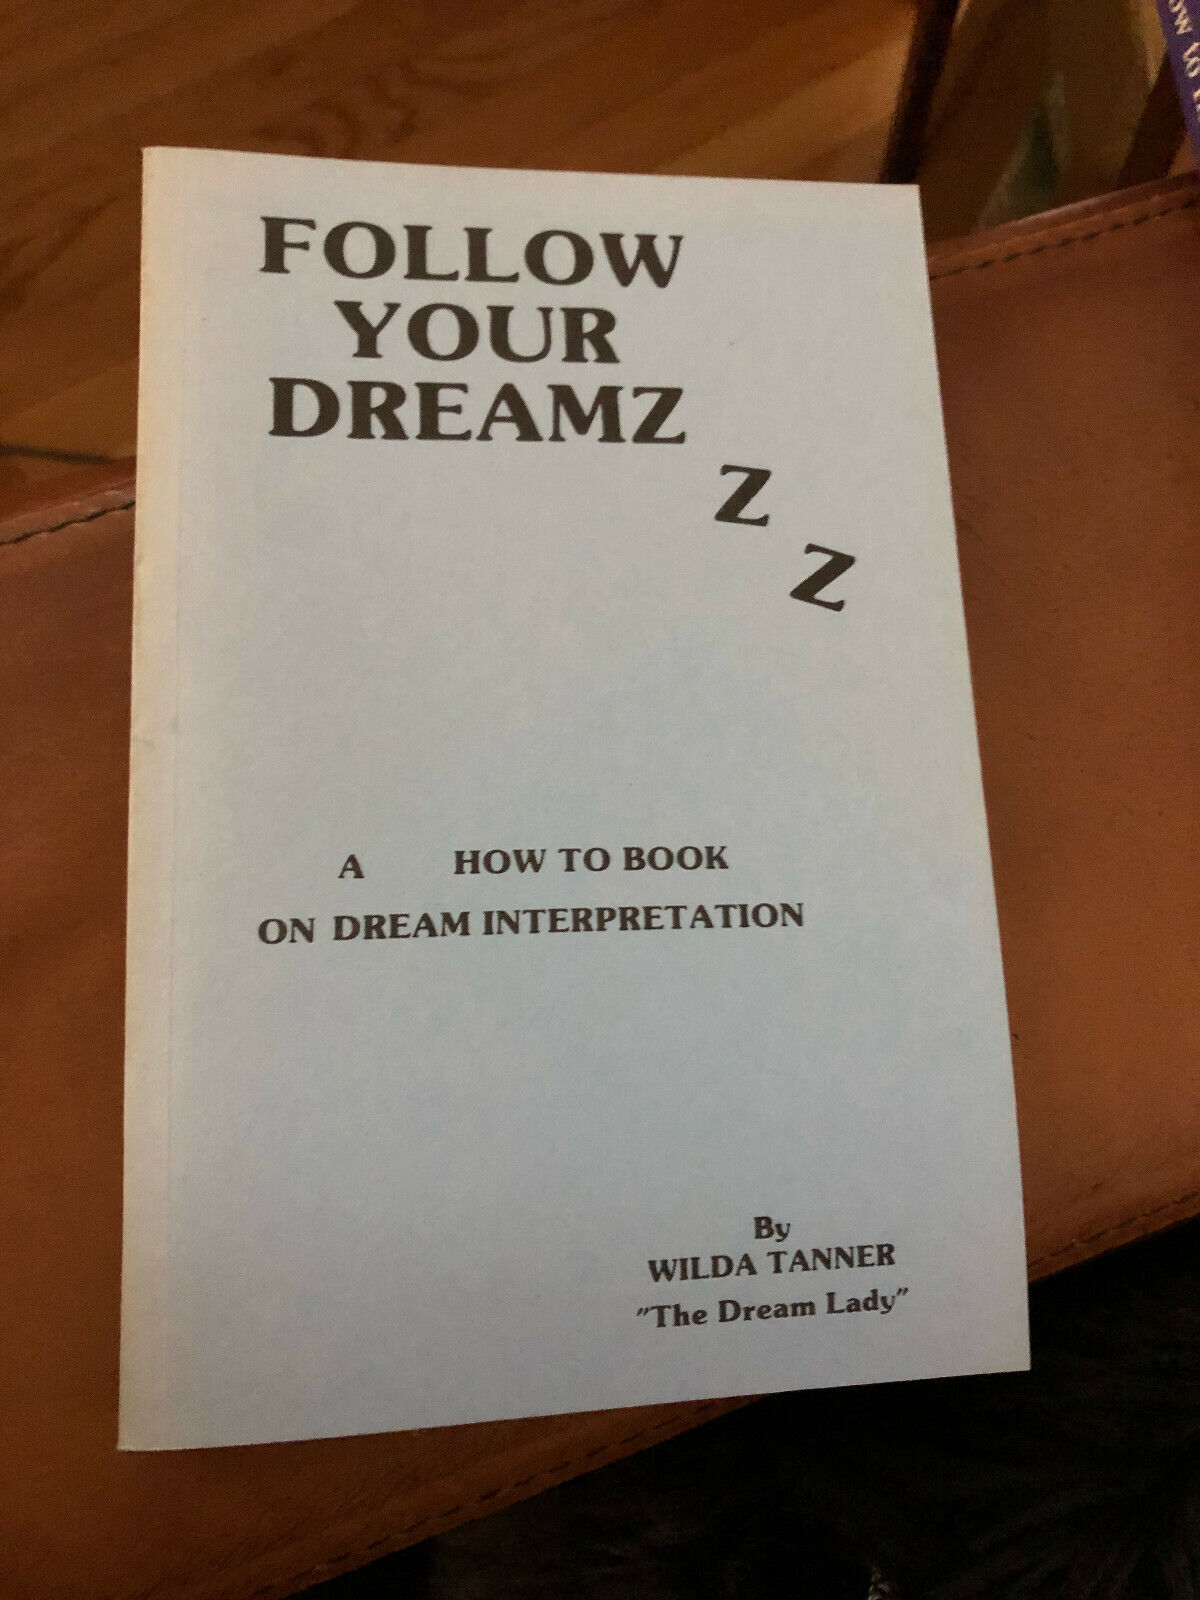 Follow Your Dreamz A How To Book On Dream Interpretation Wilda Tanner - $4.00